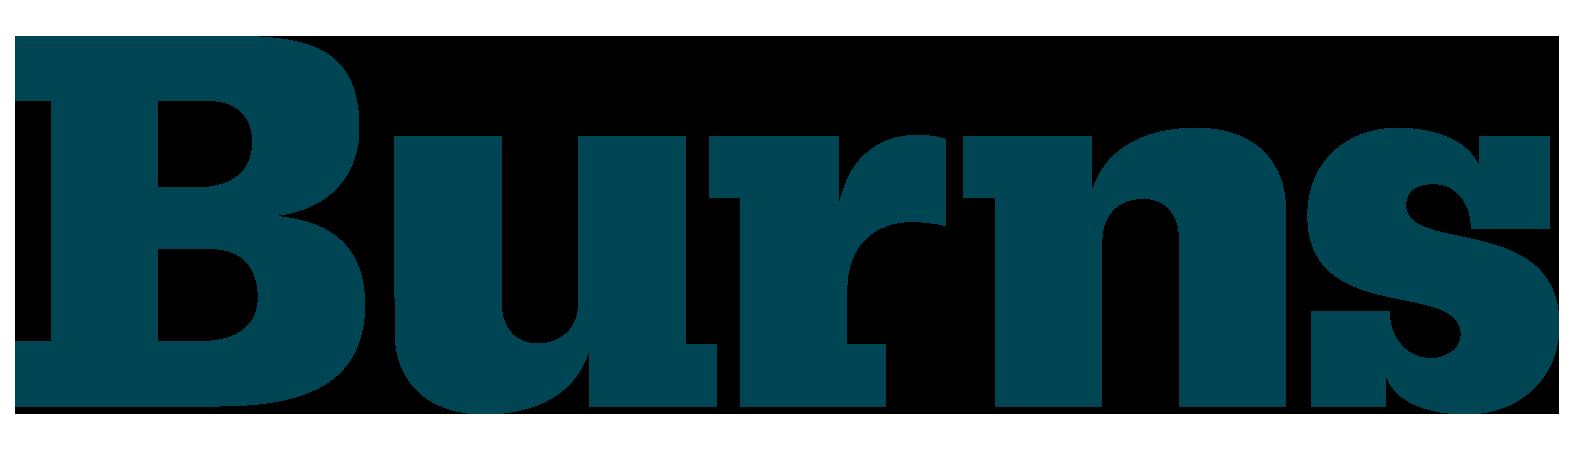 Burns Engineering, Inc. logo